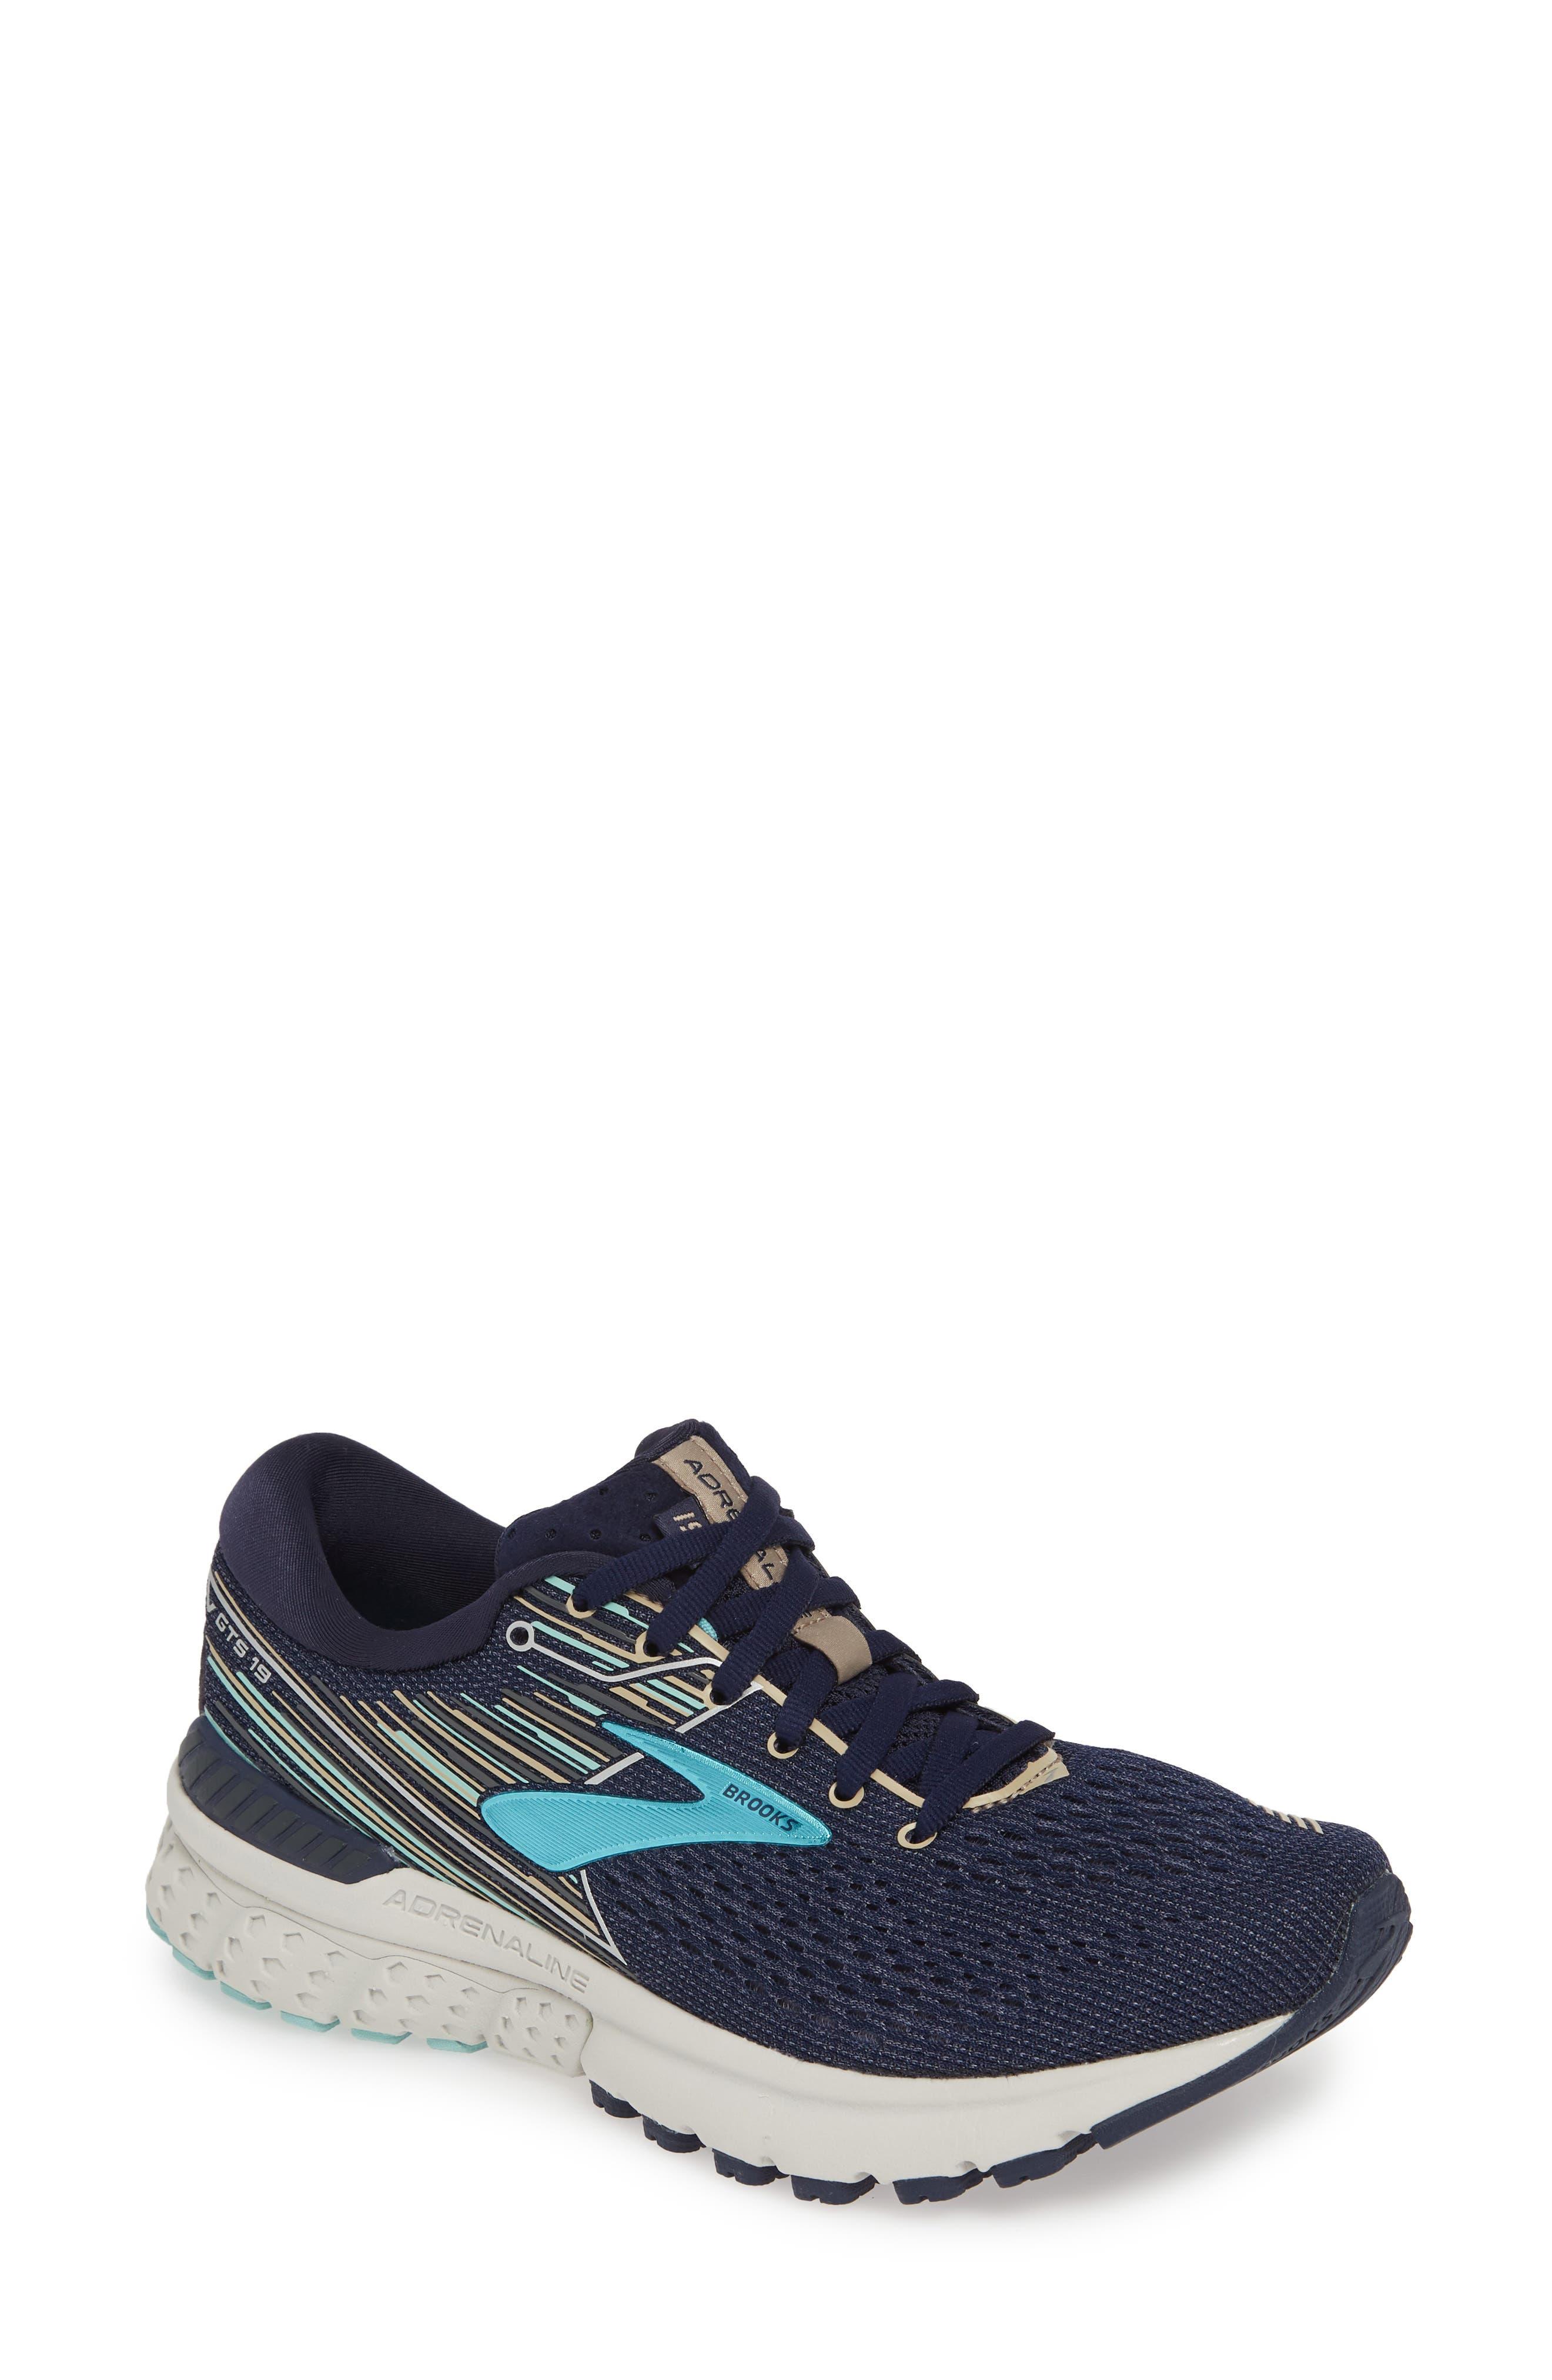 Brooks Adrenaline Gts 19 Running Shoe, Blue